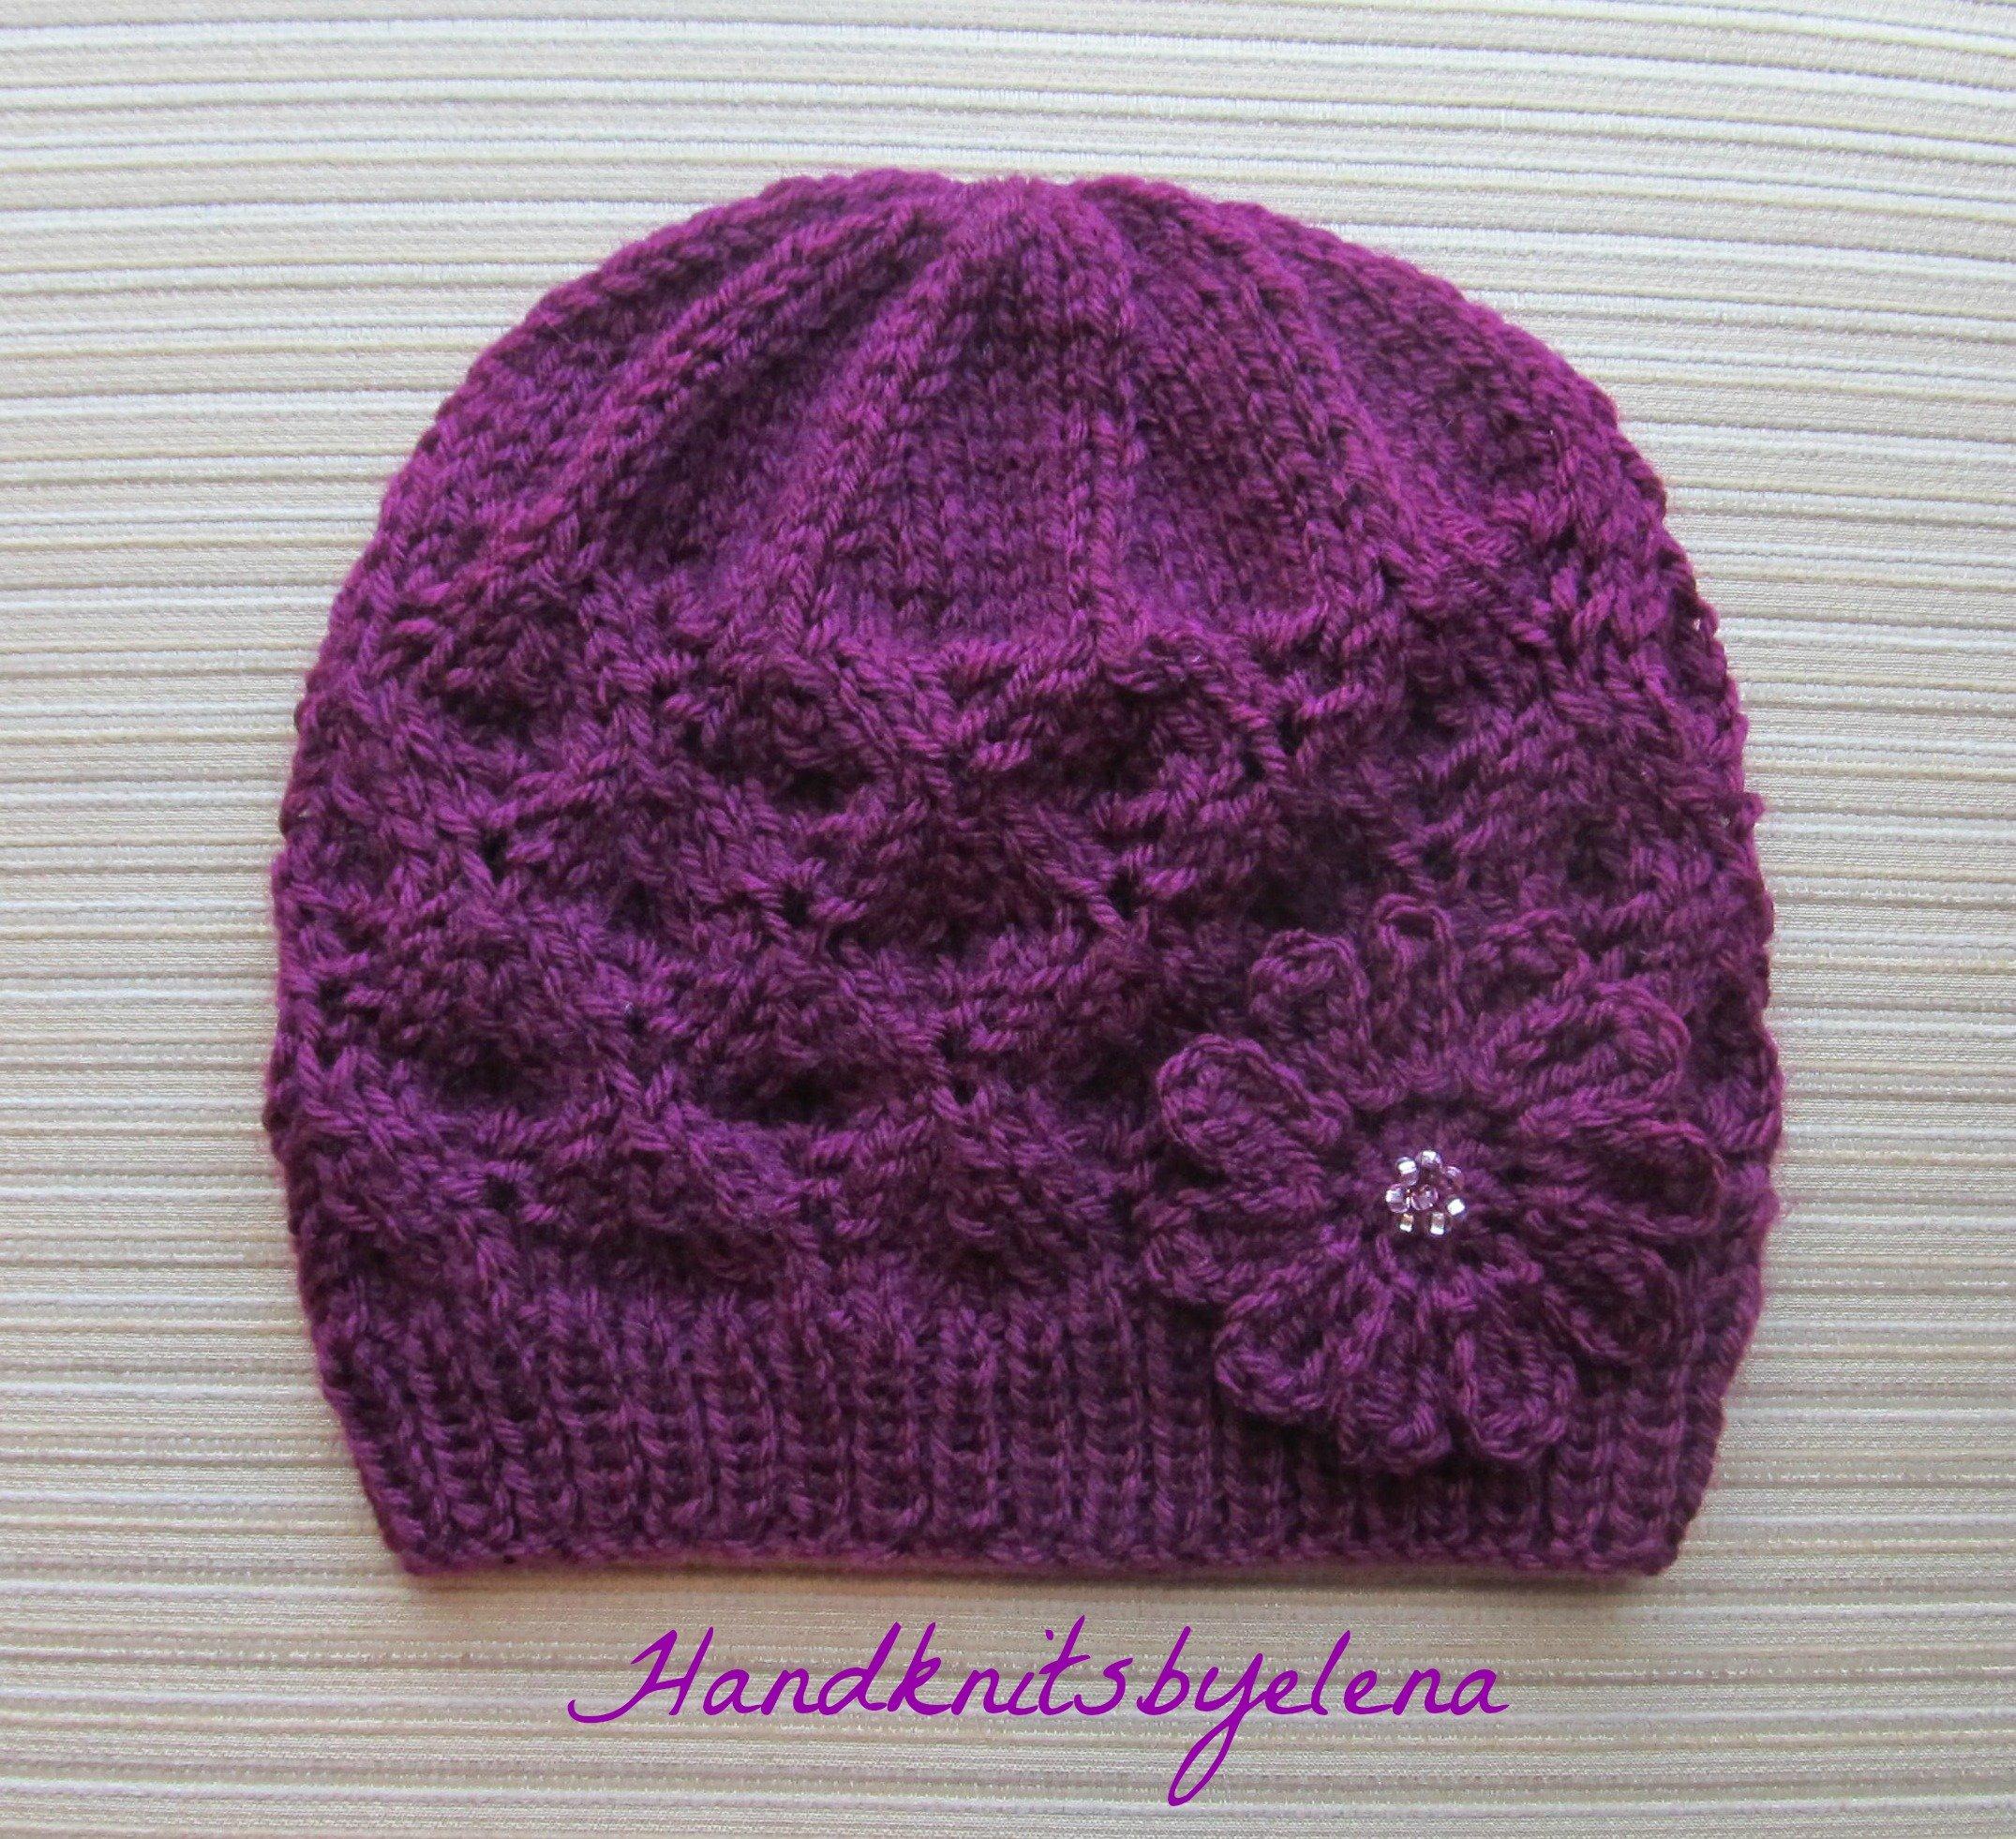 Knit Hat Patterns Straight Needles | 1000 Free Patterns